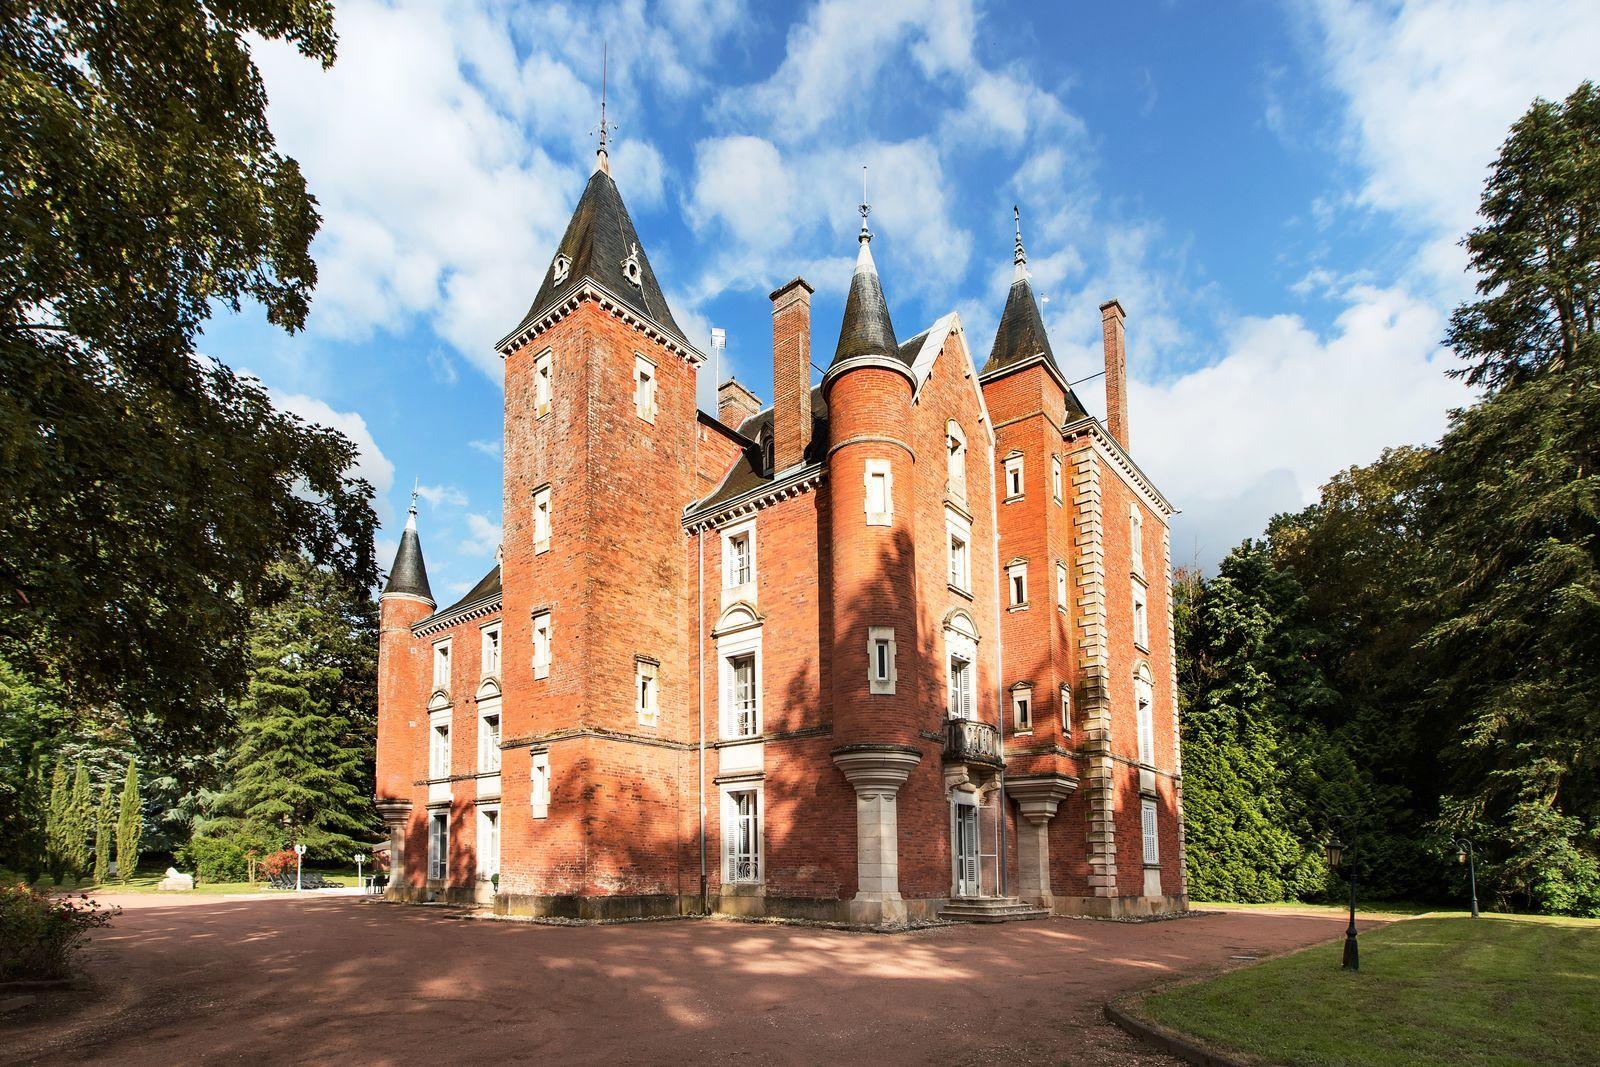 Chateau le Victoire - exclusieve kasteelvakantie Frankrijk